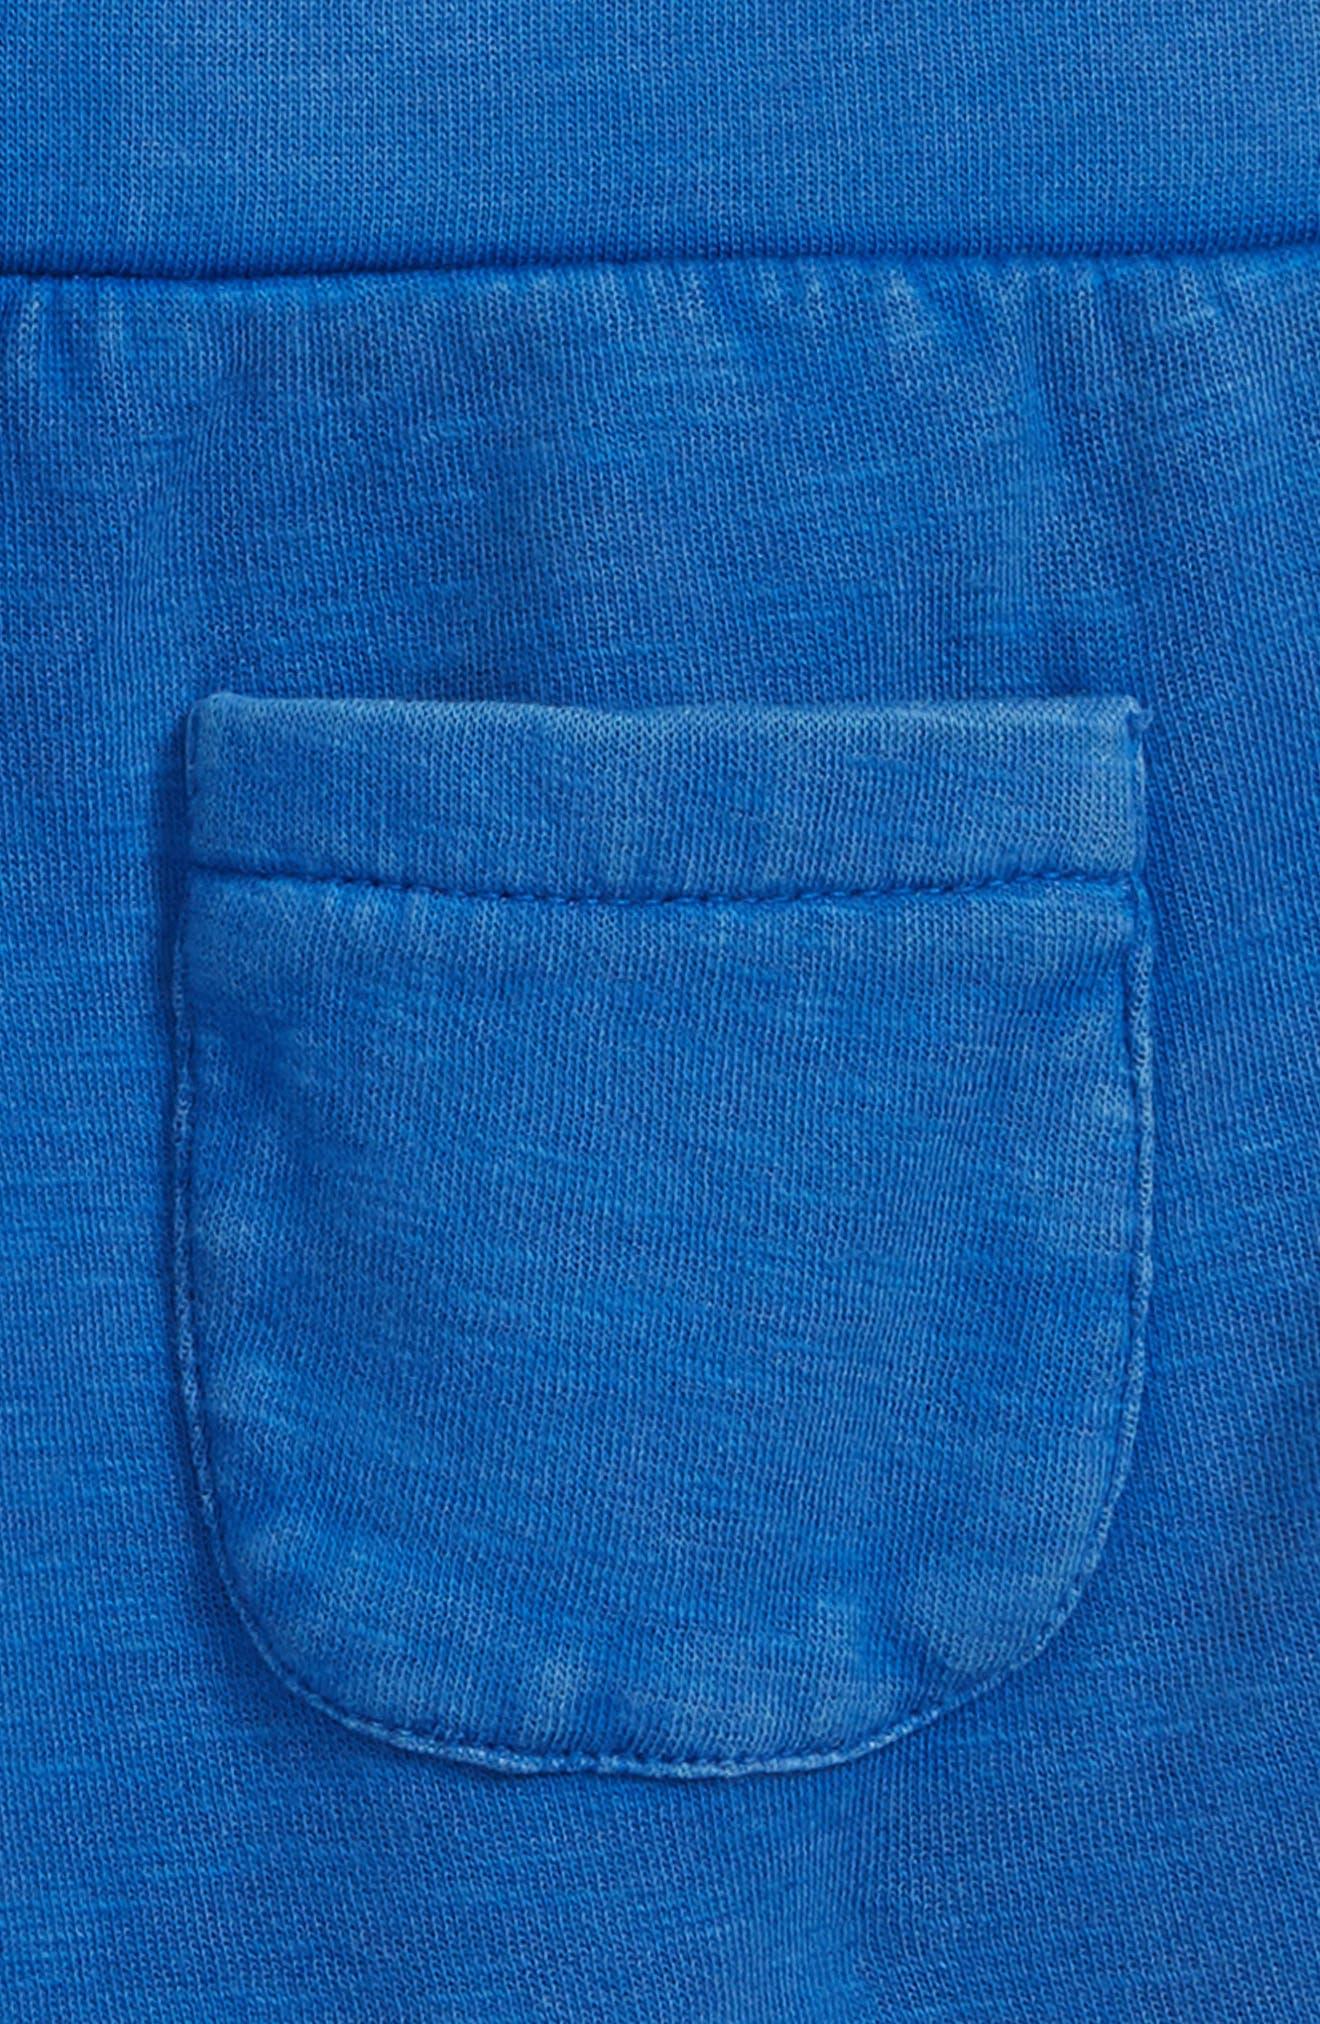 Knit Shorts,                             Alternate thumbnail 3, color,                             Blue Surf